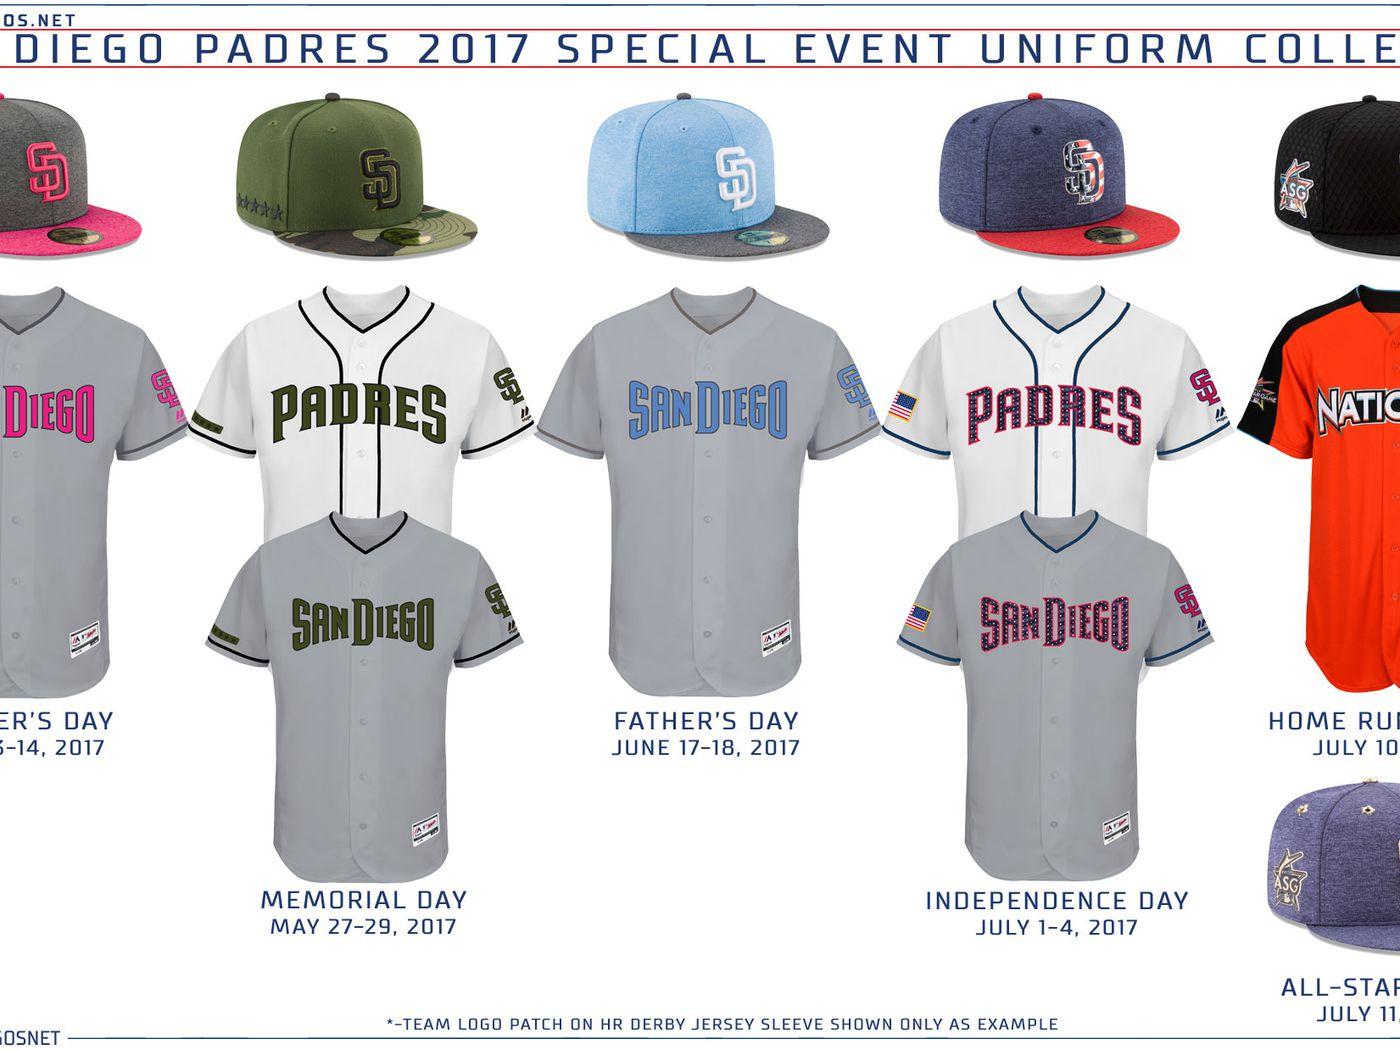 420719987c7 MLB Announces 2017 Special Event Uniforms - Gaslamp Ball